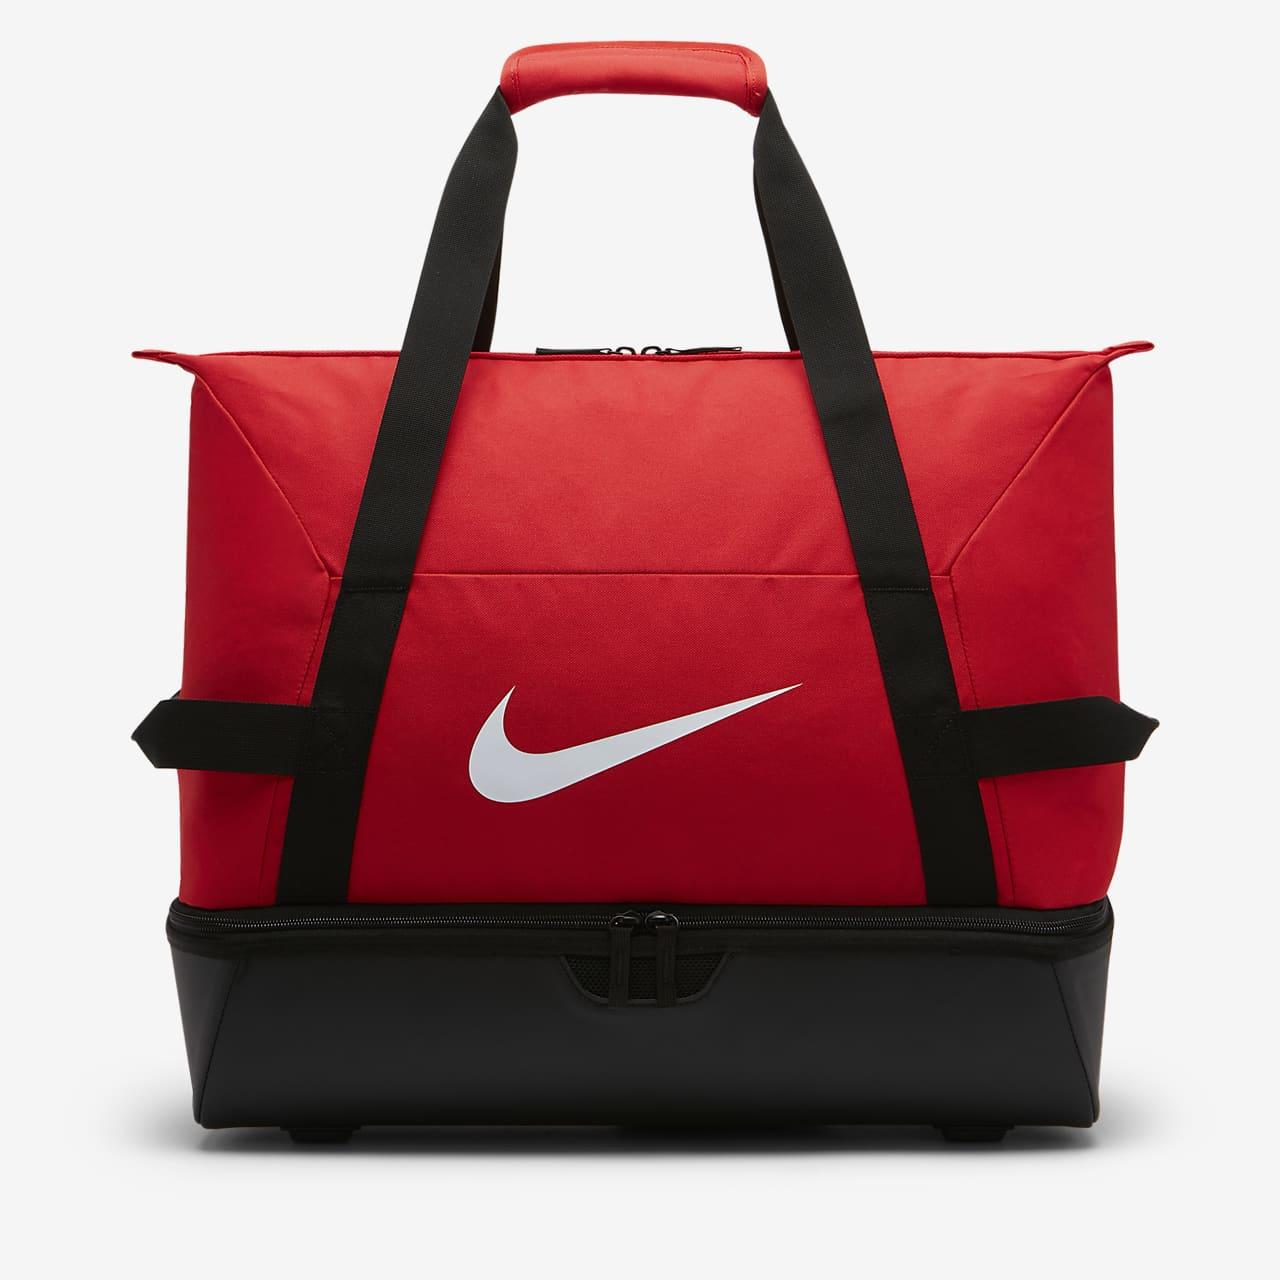 Sac de sport pour le football Nike Academy Team Hardcase (grande taille)